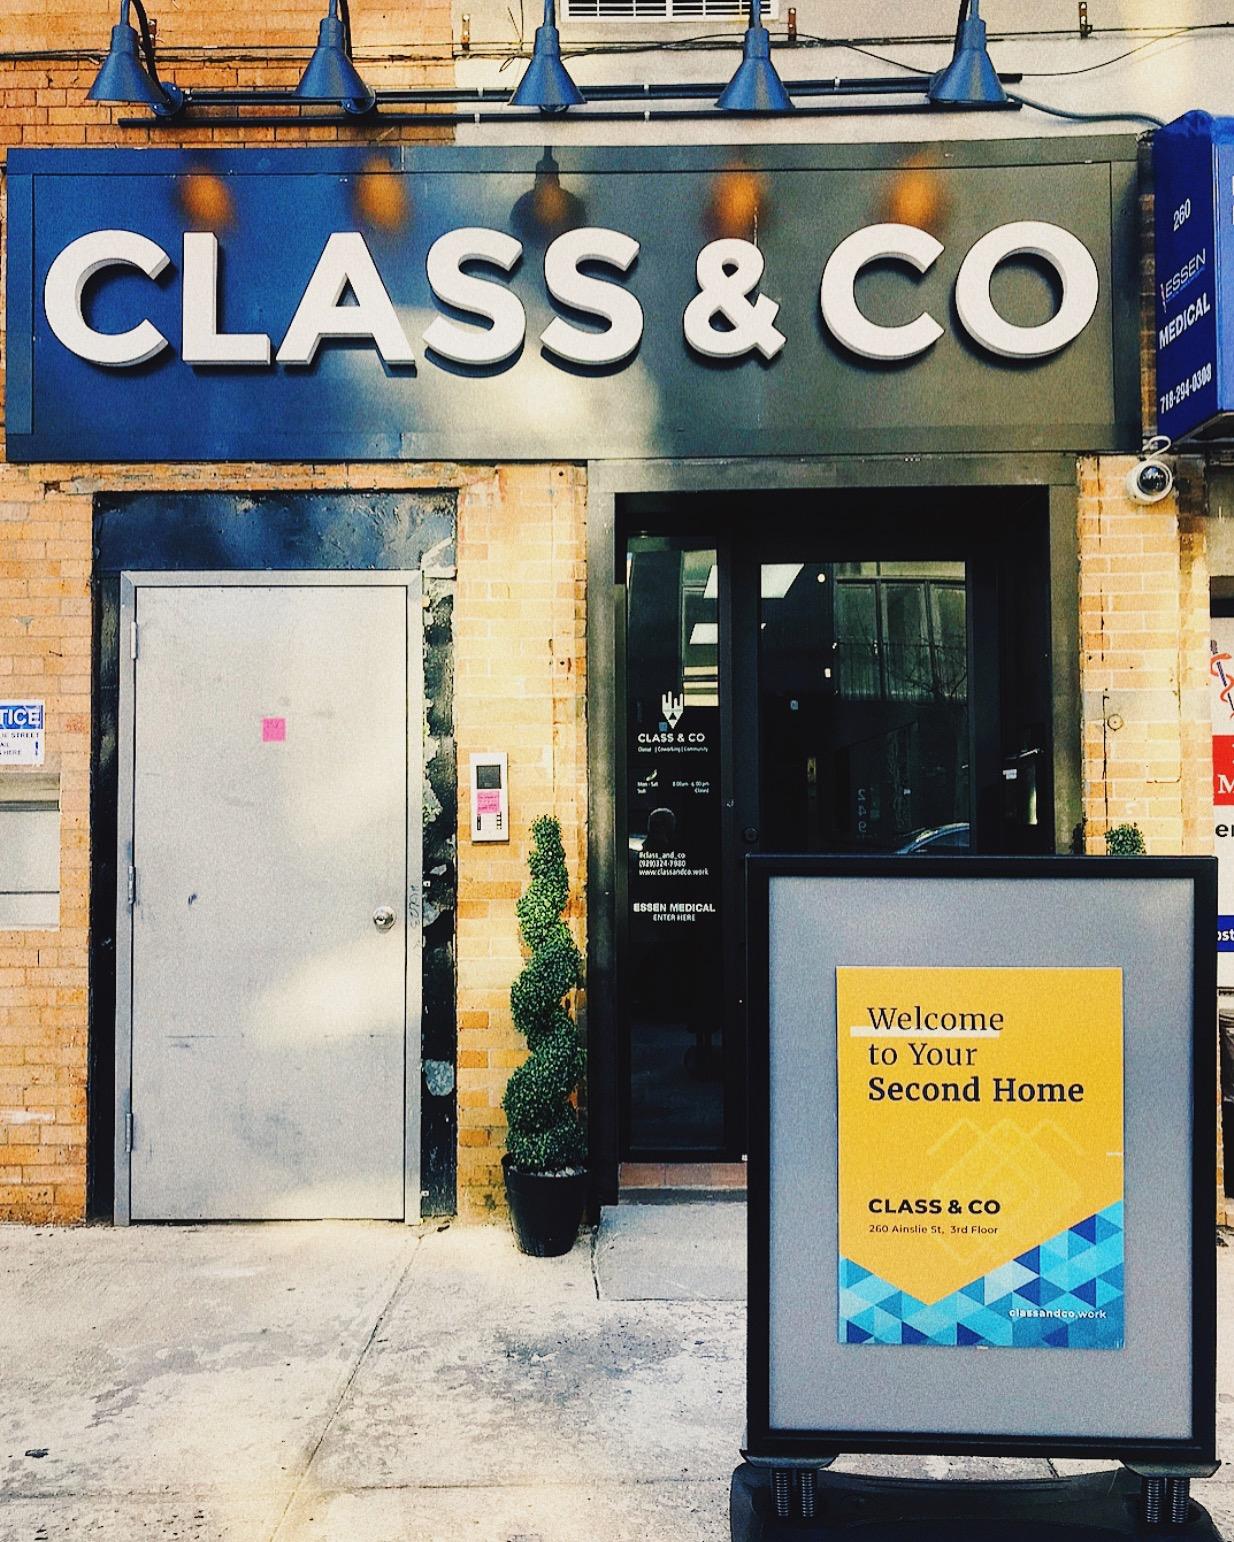 class-&-co-coworking-new-york-city.JPG